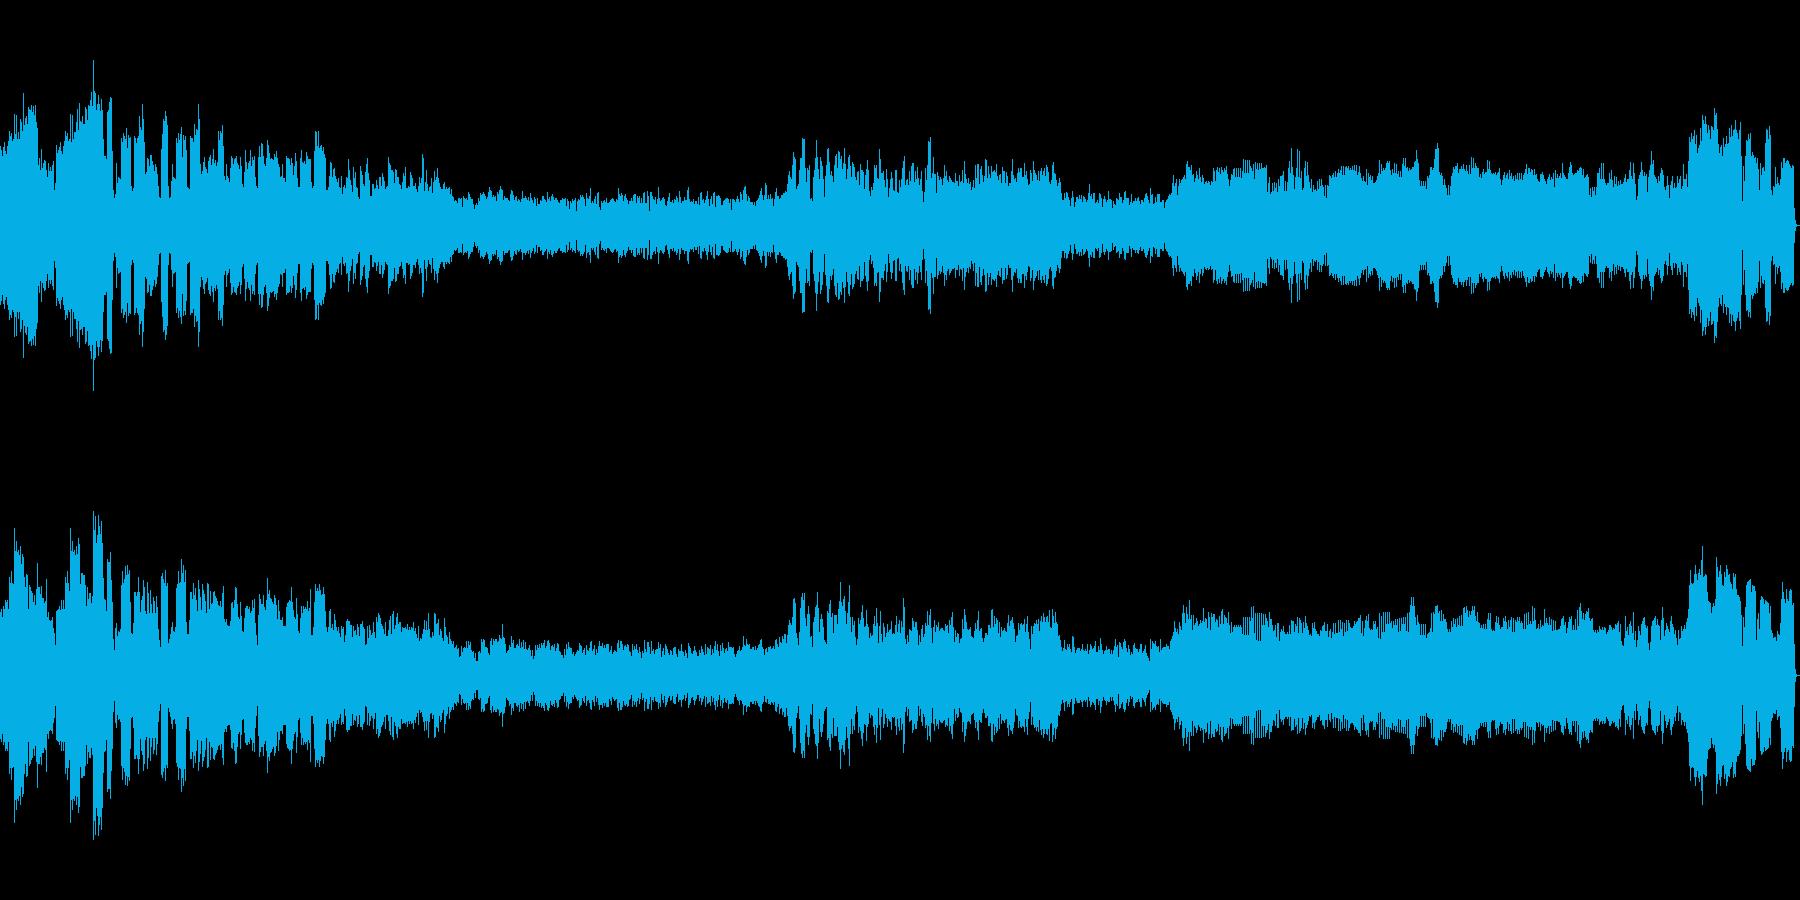 「BGMの宝庫4」-シャコンヌAよりの再生済みの波形